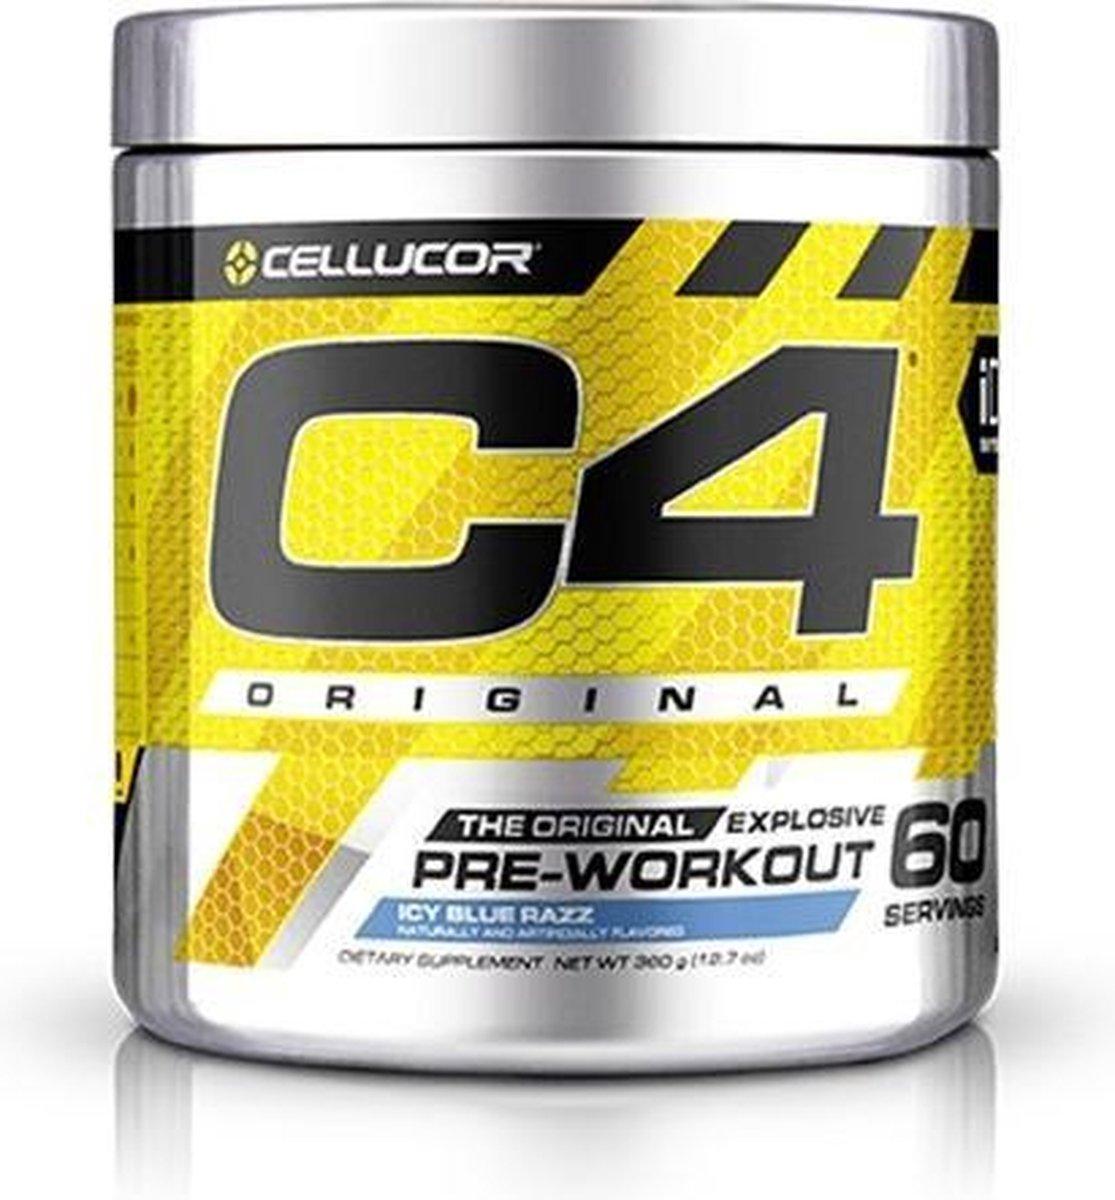 Cellucor C4 Original Pre-Workout - 60 Doseringen - Orange Burst